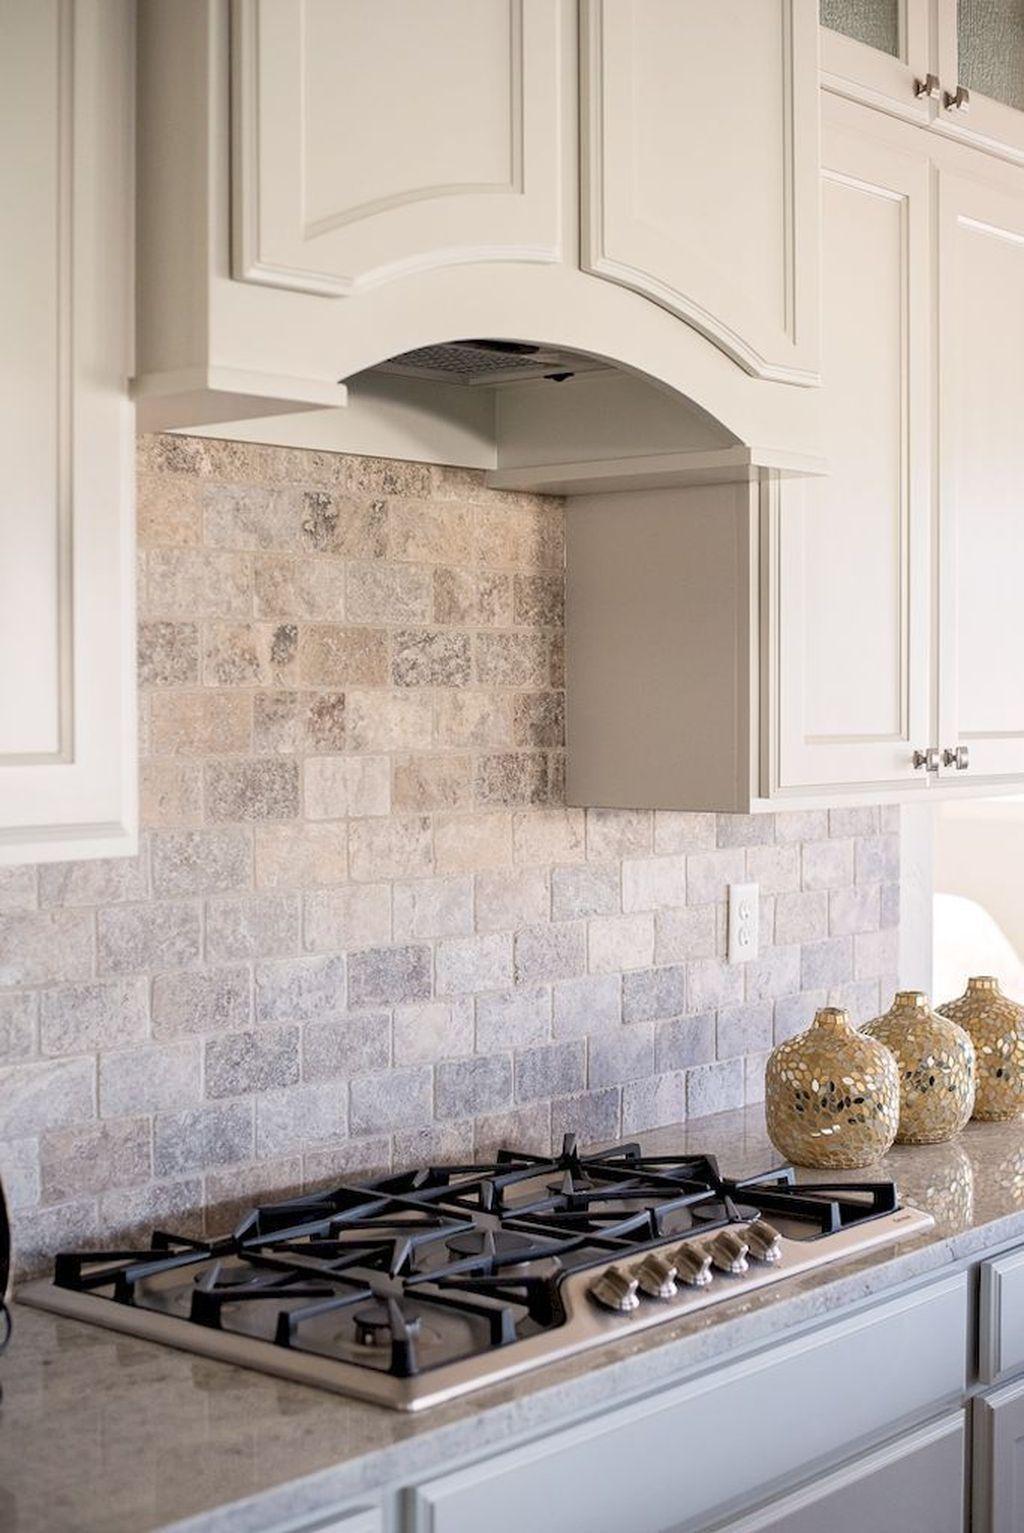 Cool the best kitchen backsplash tiles and design ideas kitchen